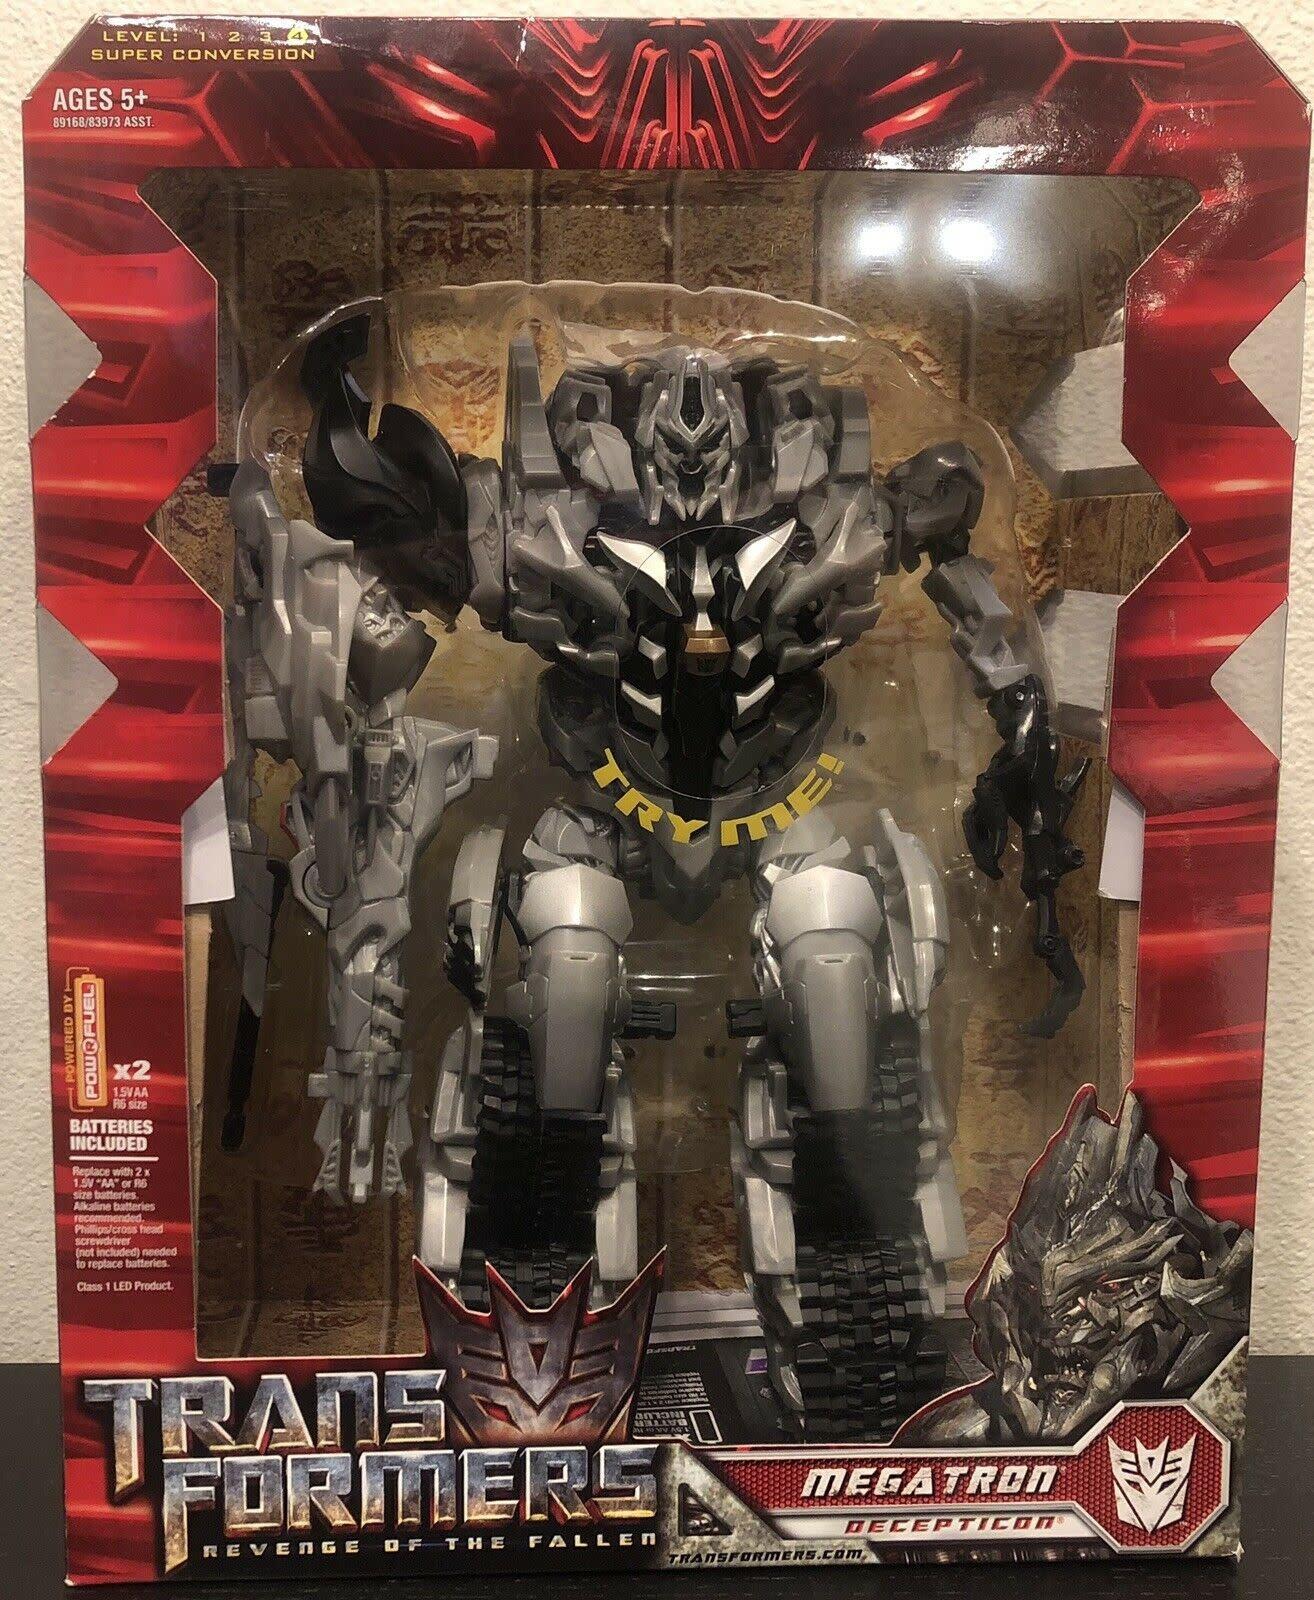 Hasbro Transformers; Revenge Of The Fallen-Class Leader Megatron Decepticon 2008